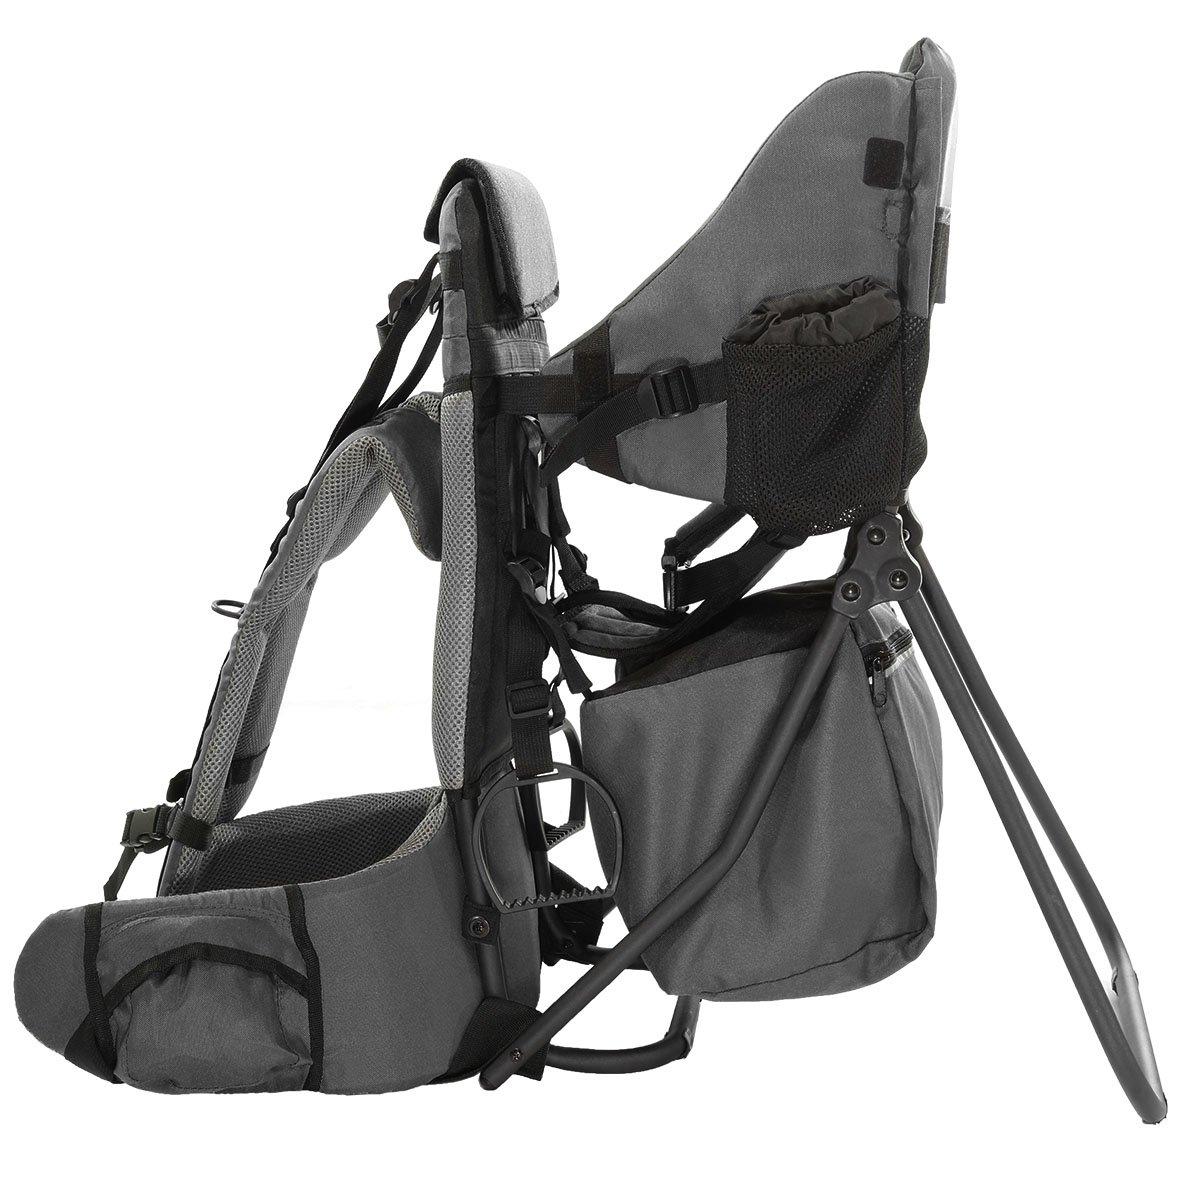 29eaef6960f Sherpani hiking baby backpack fairway golf and print jpg 1200x1200 Sherpani  hiking backpack